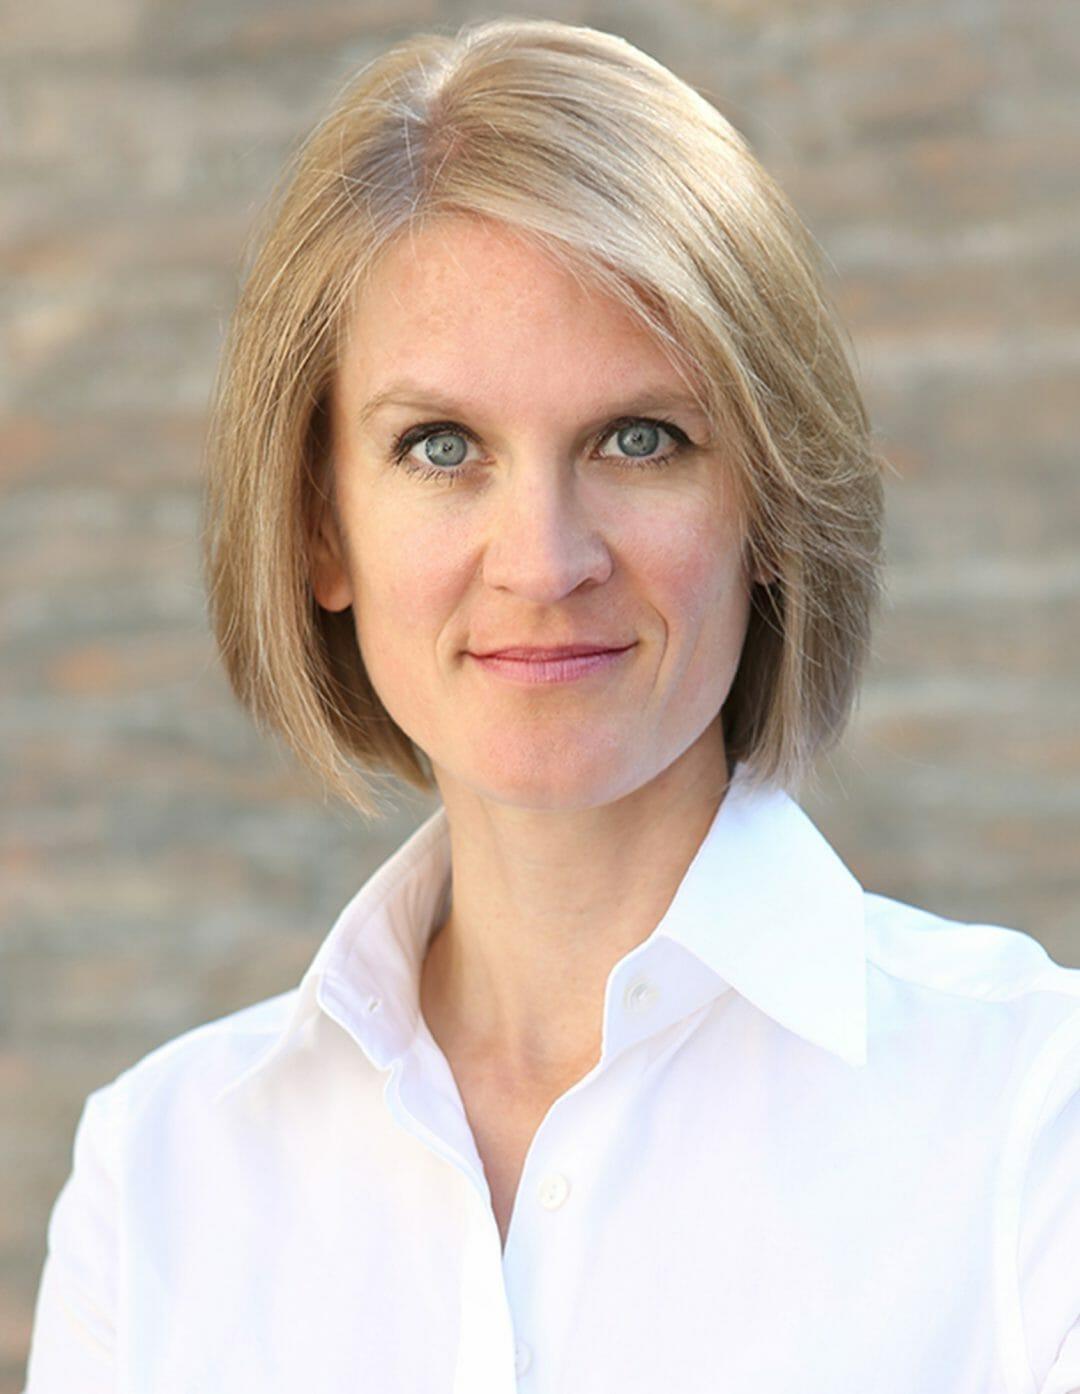 Diana Meyel is Advisor at Ananda Impact Ventures